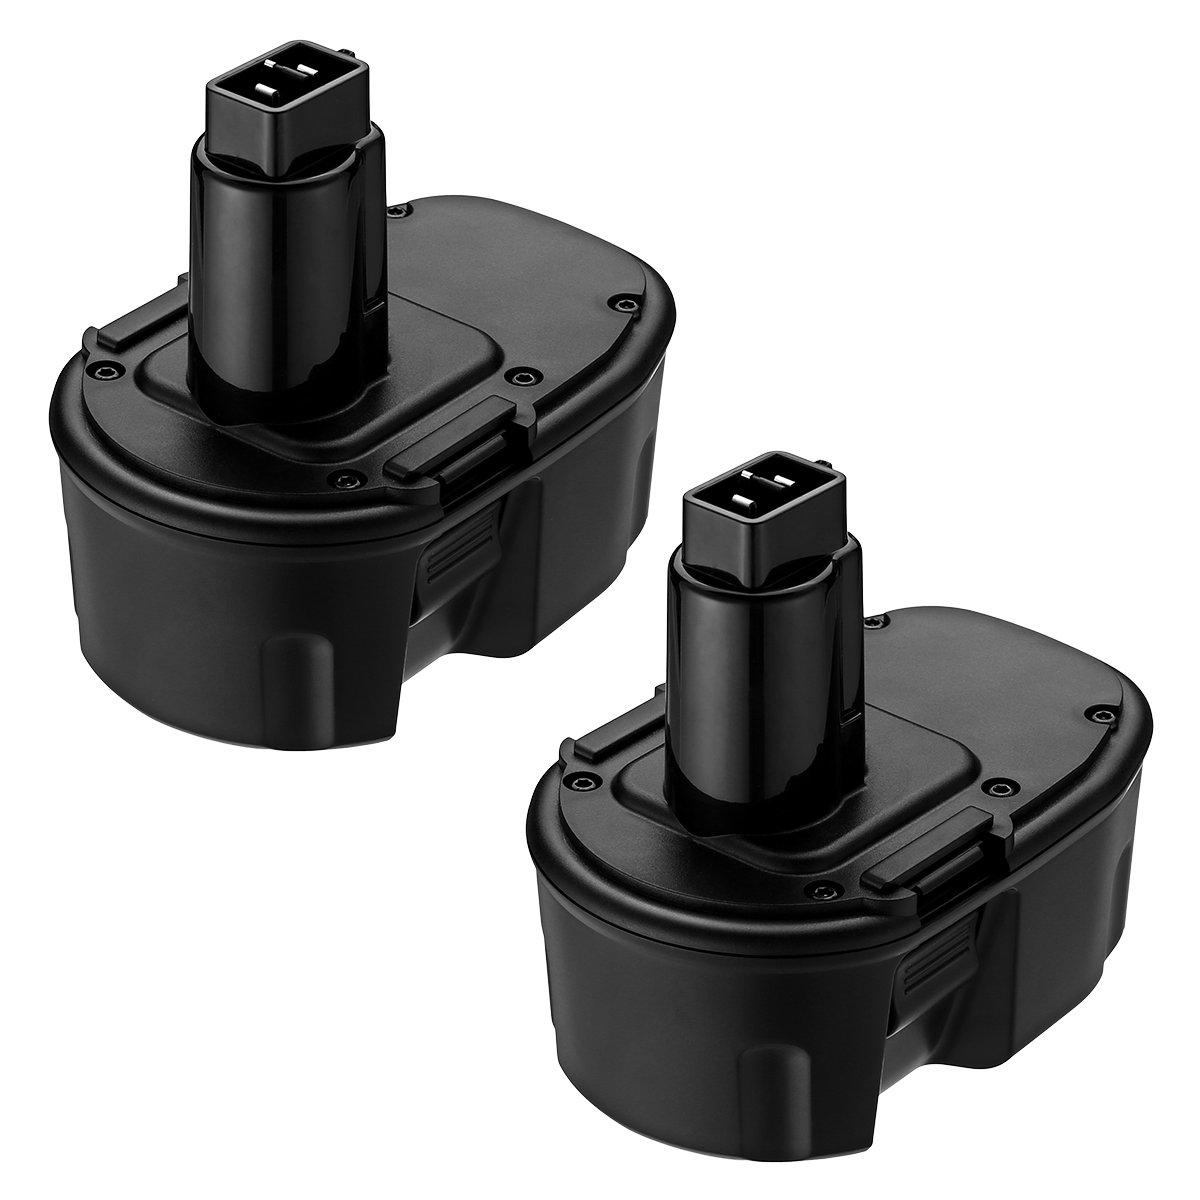 FirstPower 3.5Ah Dewalt 18V XRP NI-MH Replacement Battery for DC9096 DC9099 DW9096 DW9095 DE9503 Dewalt 18volt Cordless Power Tools - 2Packs (2 Pack)